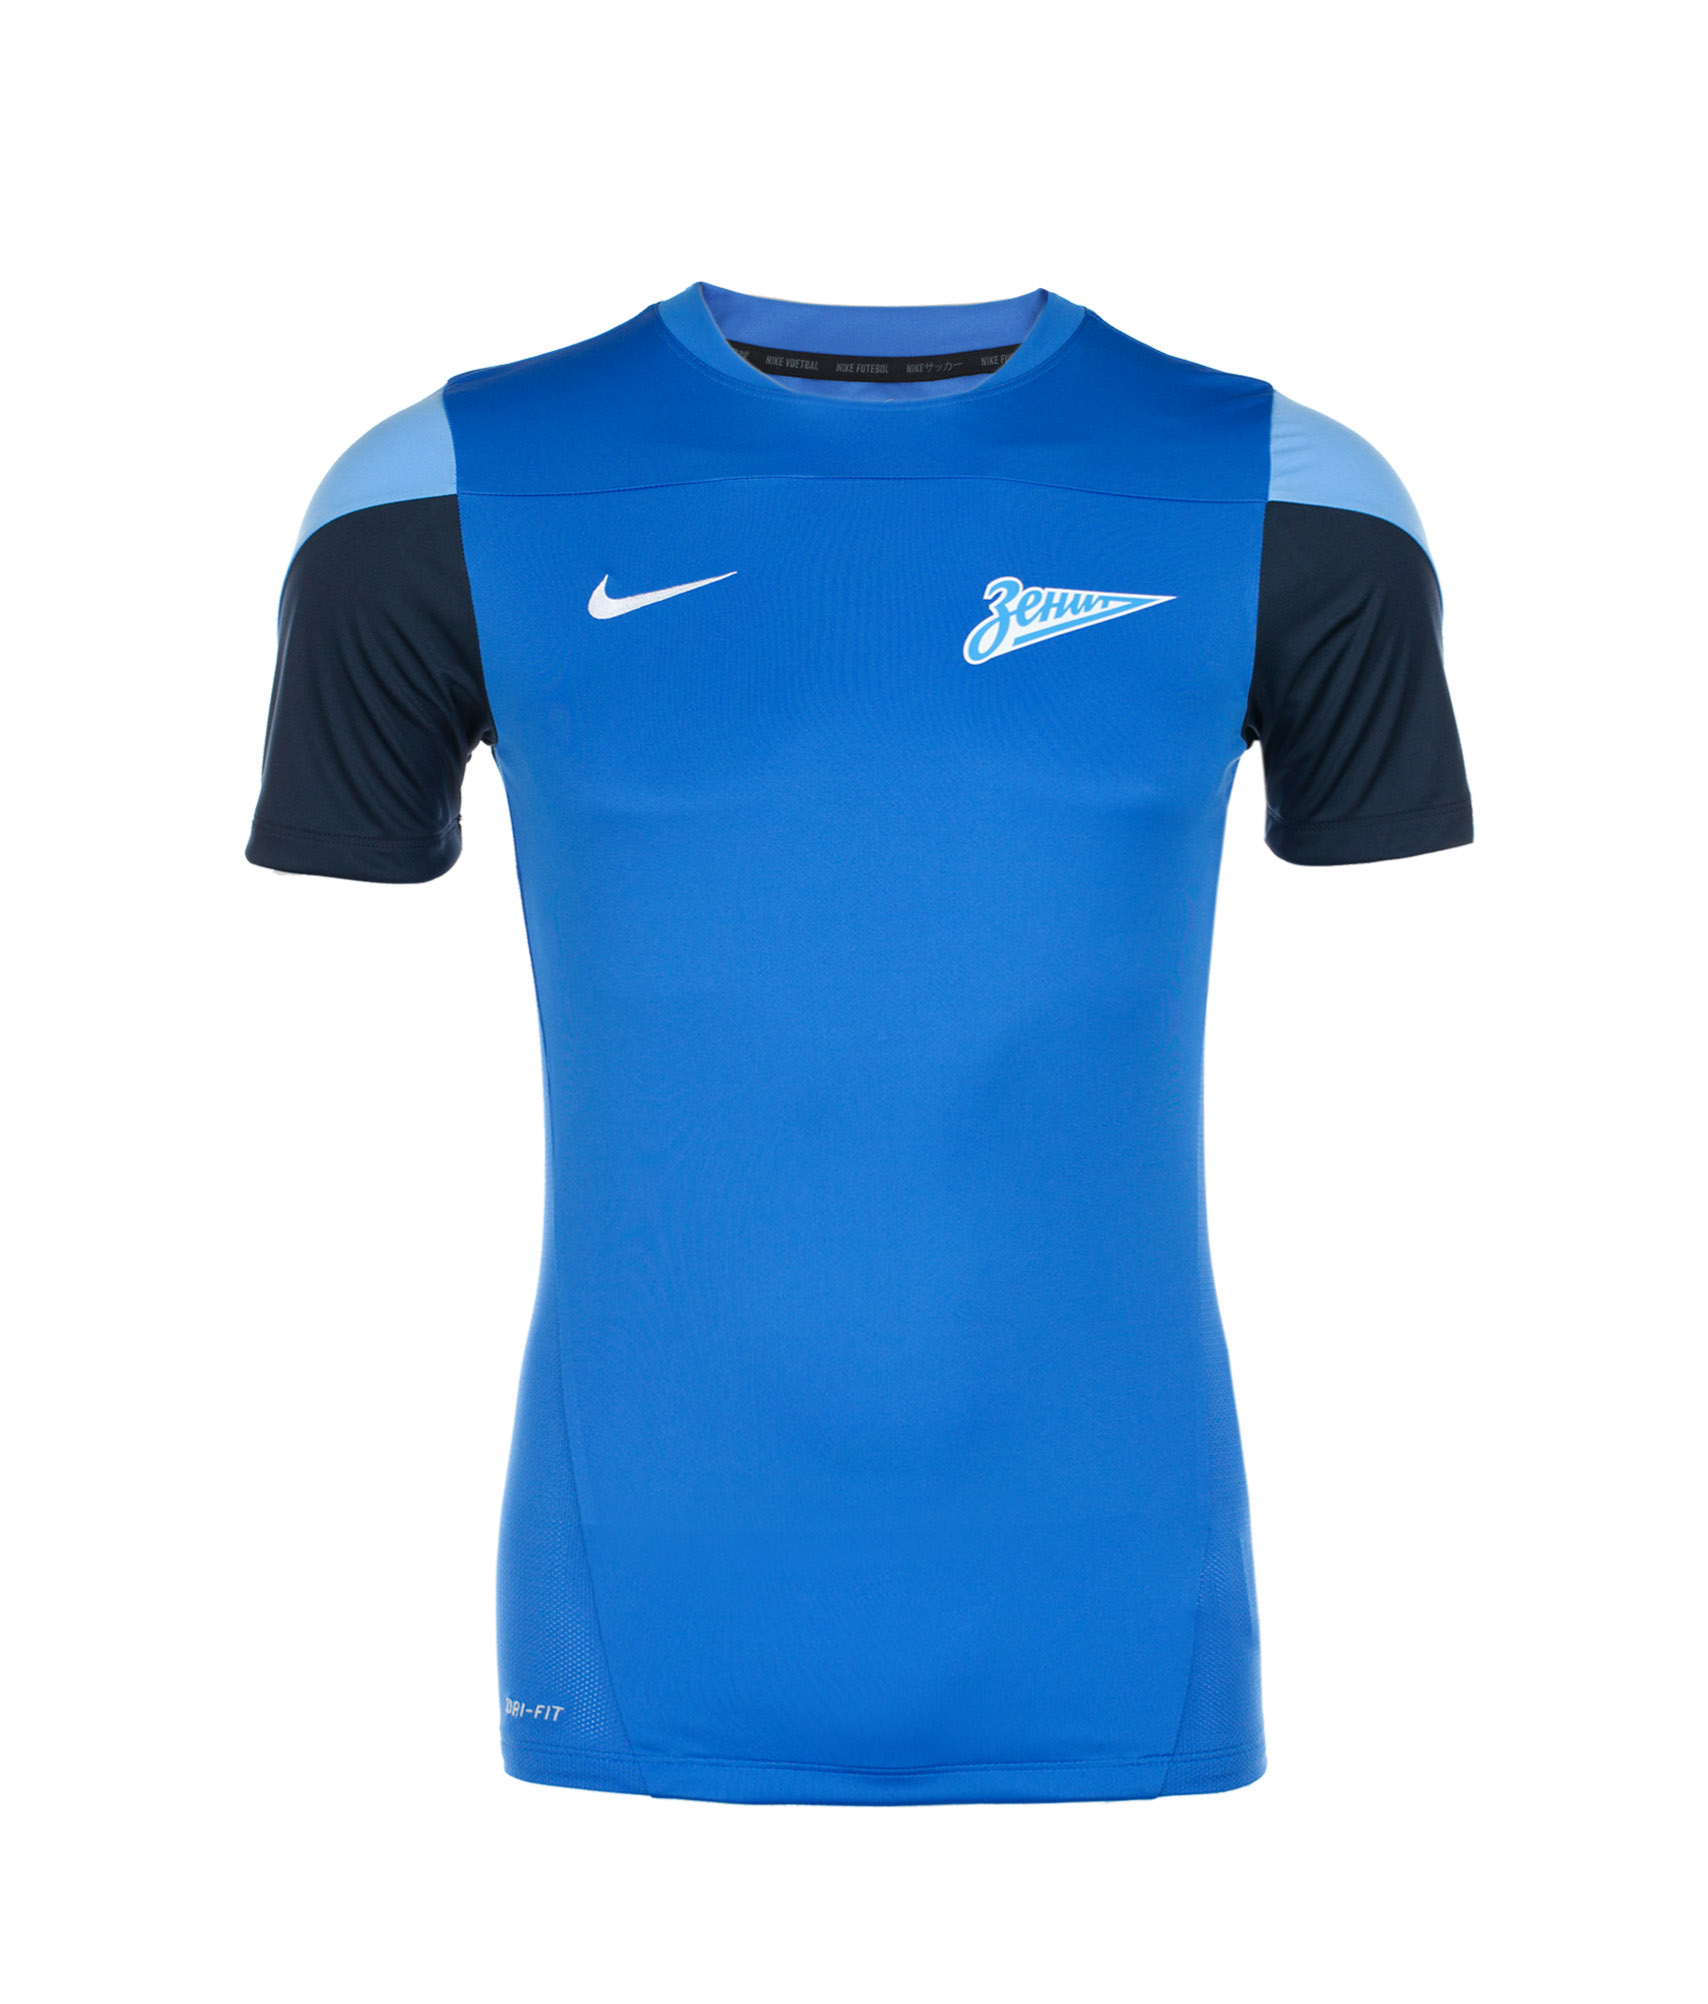 Футболка тренировочная Nike SQUAD SS TRNG TOP, Цвет-Синий, Размер-L